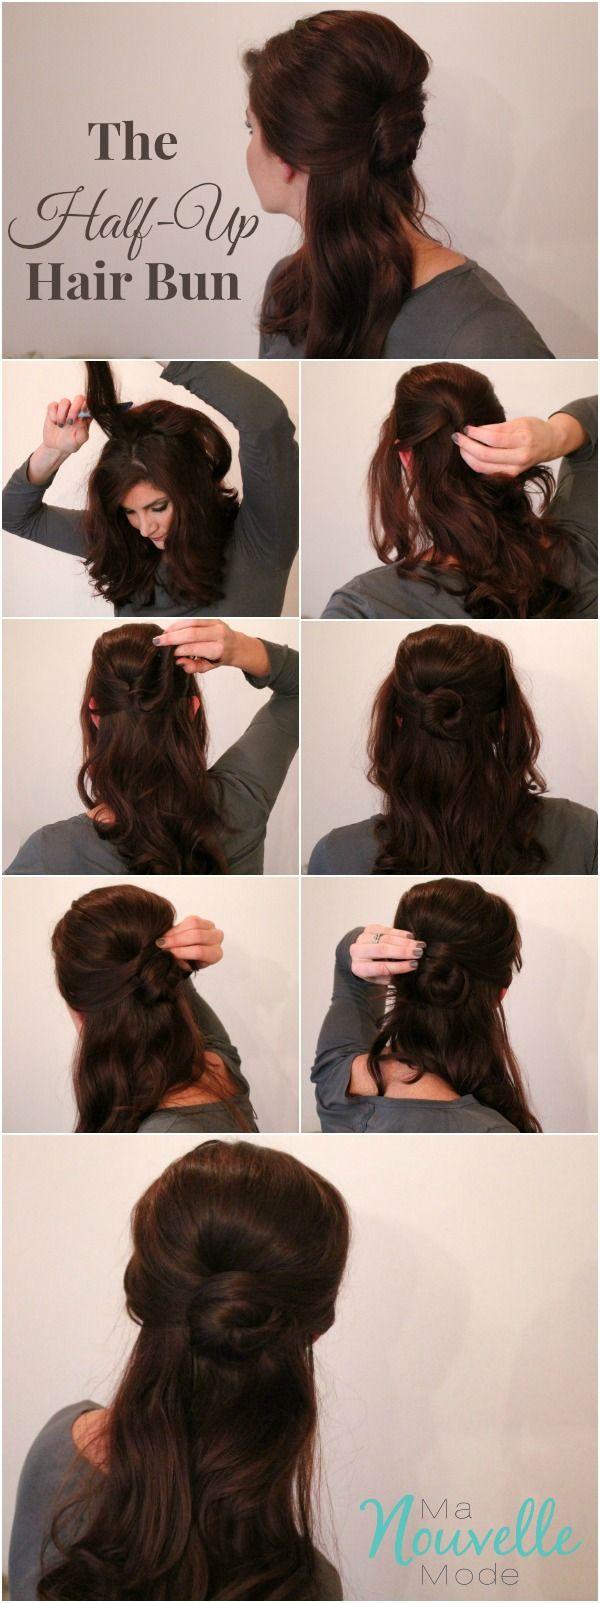 Half Up Hair Bun Ma Nouvelle Mode Belle Hairstyle Hair Styles Hair Tutorial